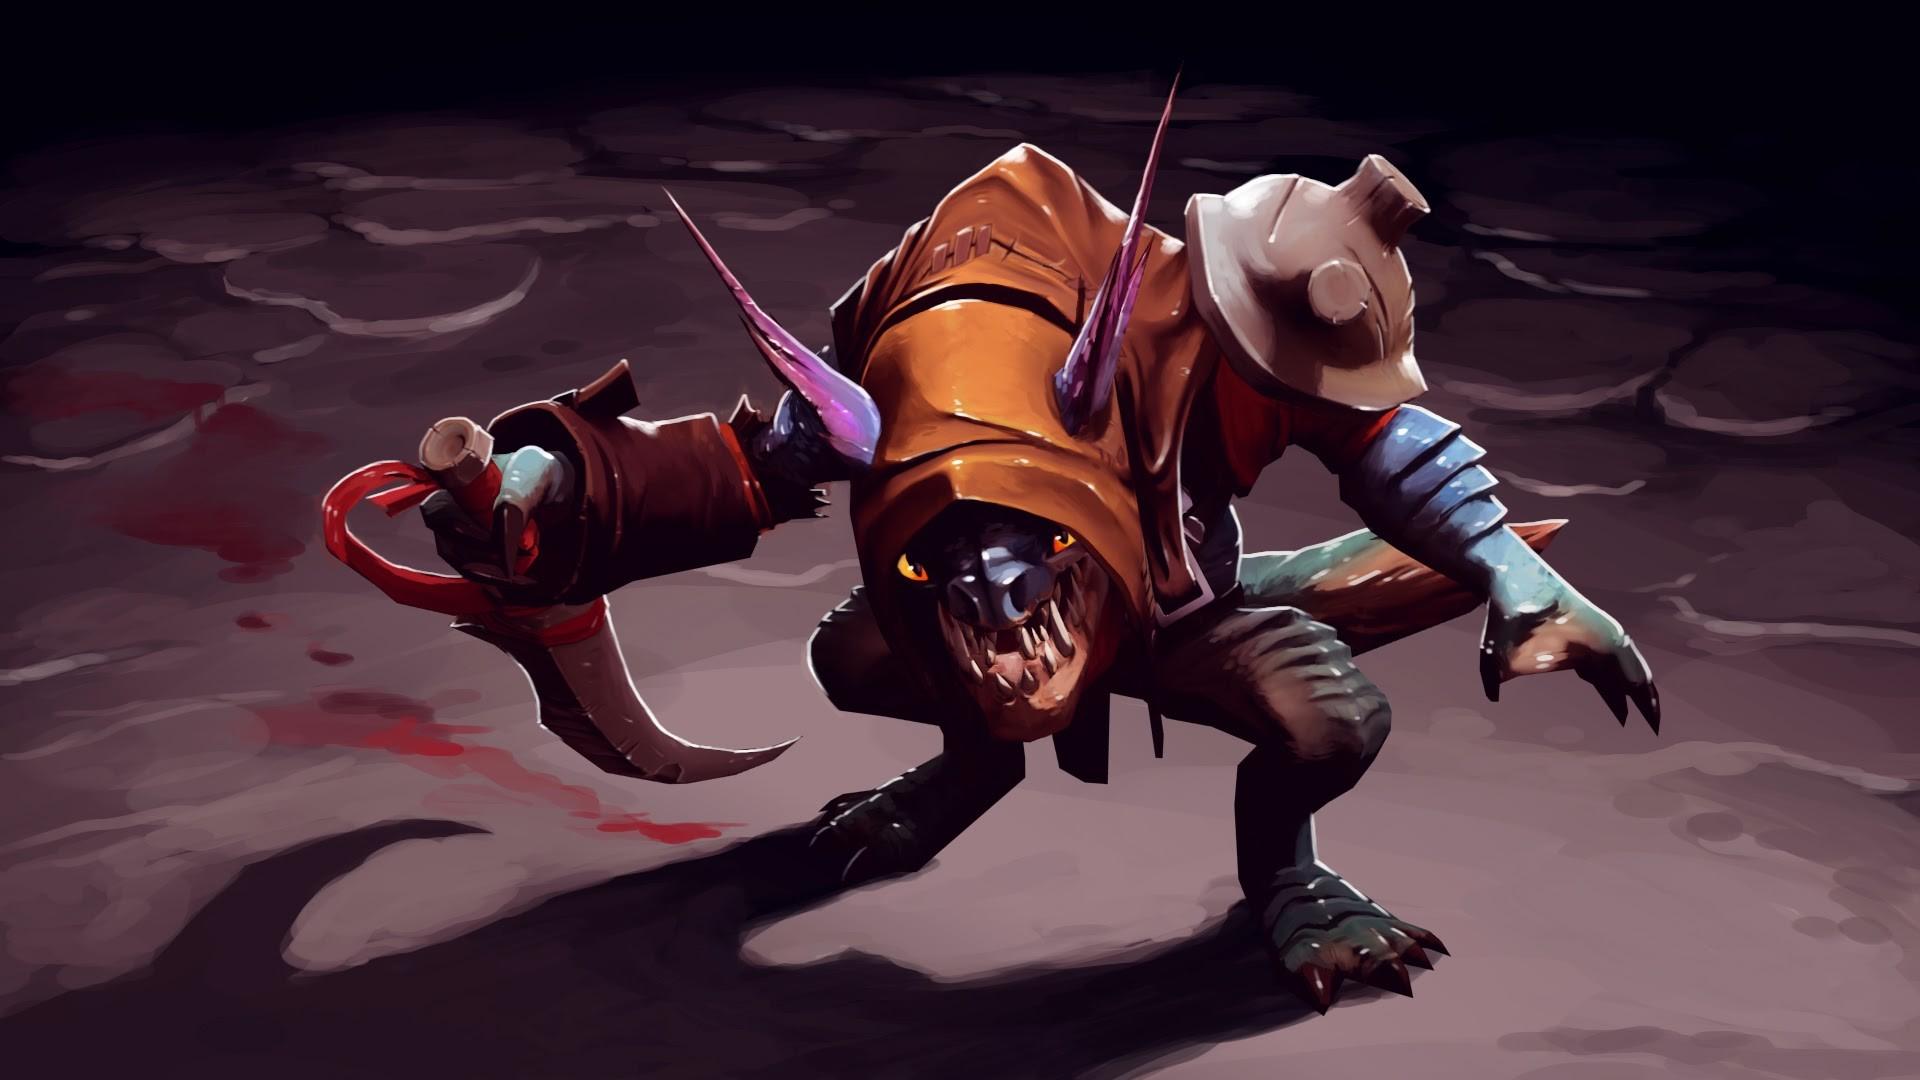 slark-harboured-assassin-dota-2-hero-hd-wallpaper-hawtkoffee-1920×1080.jpg  (1920×1080) | DotA 2 Items and Heroes | Pinterest